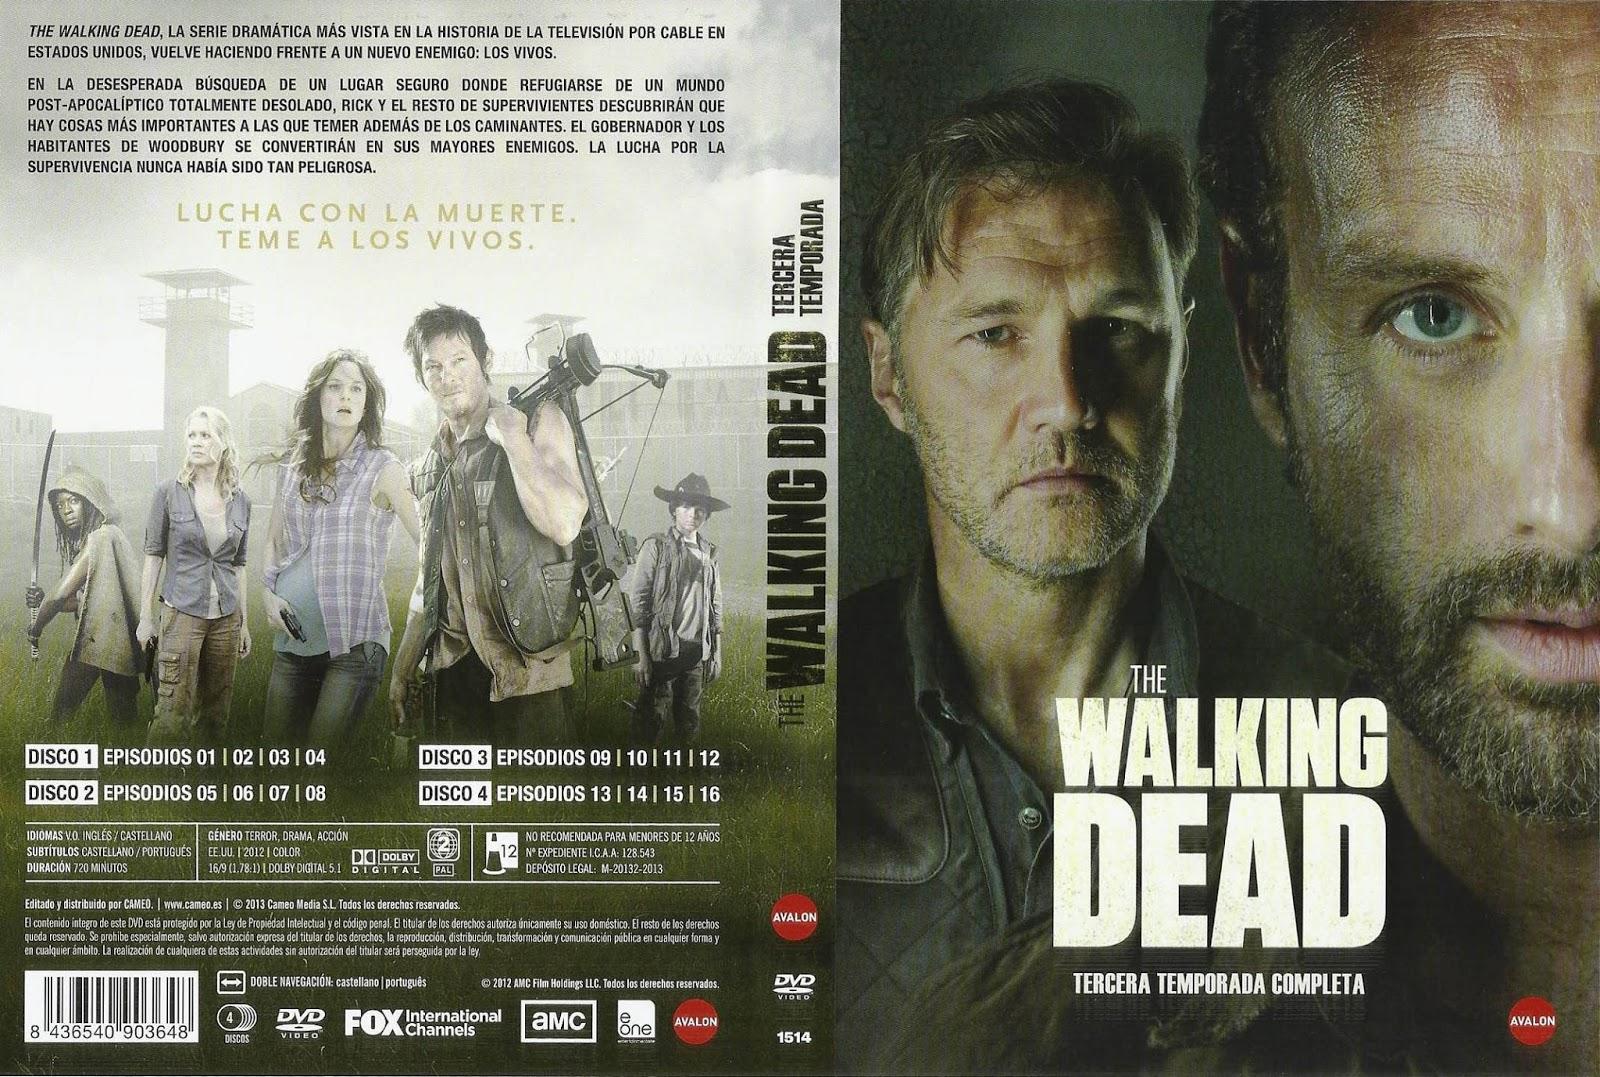 Series videos the walking dead 3 temporada - Jang ok jung live in ...